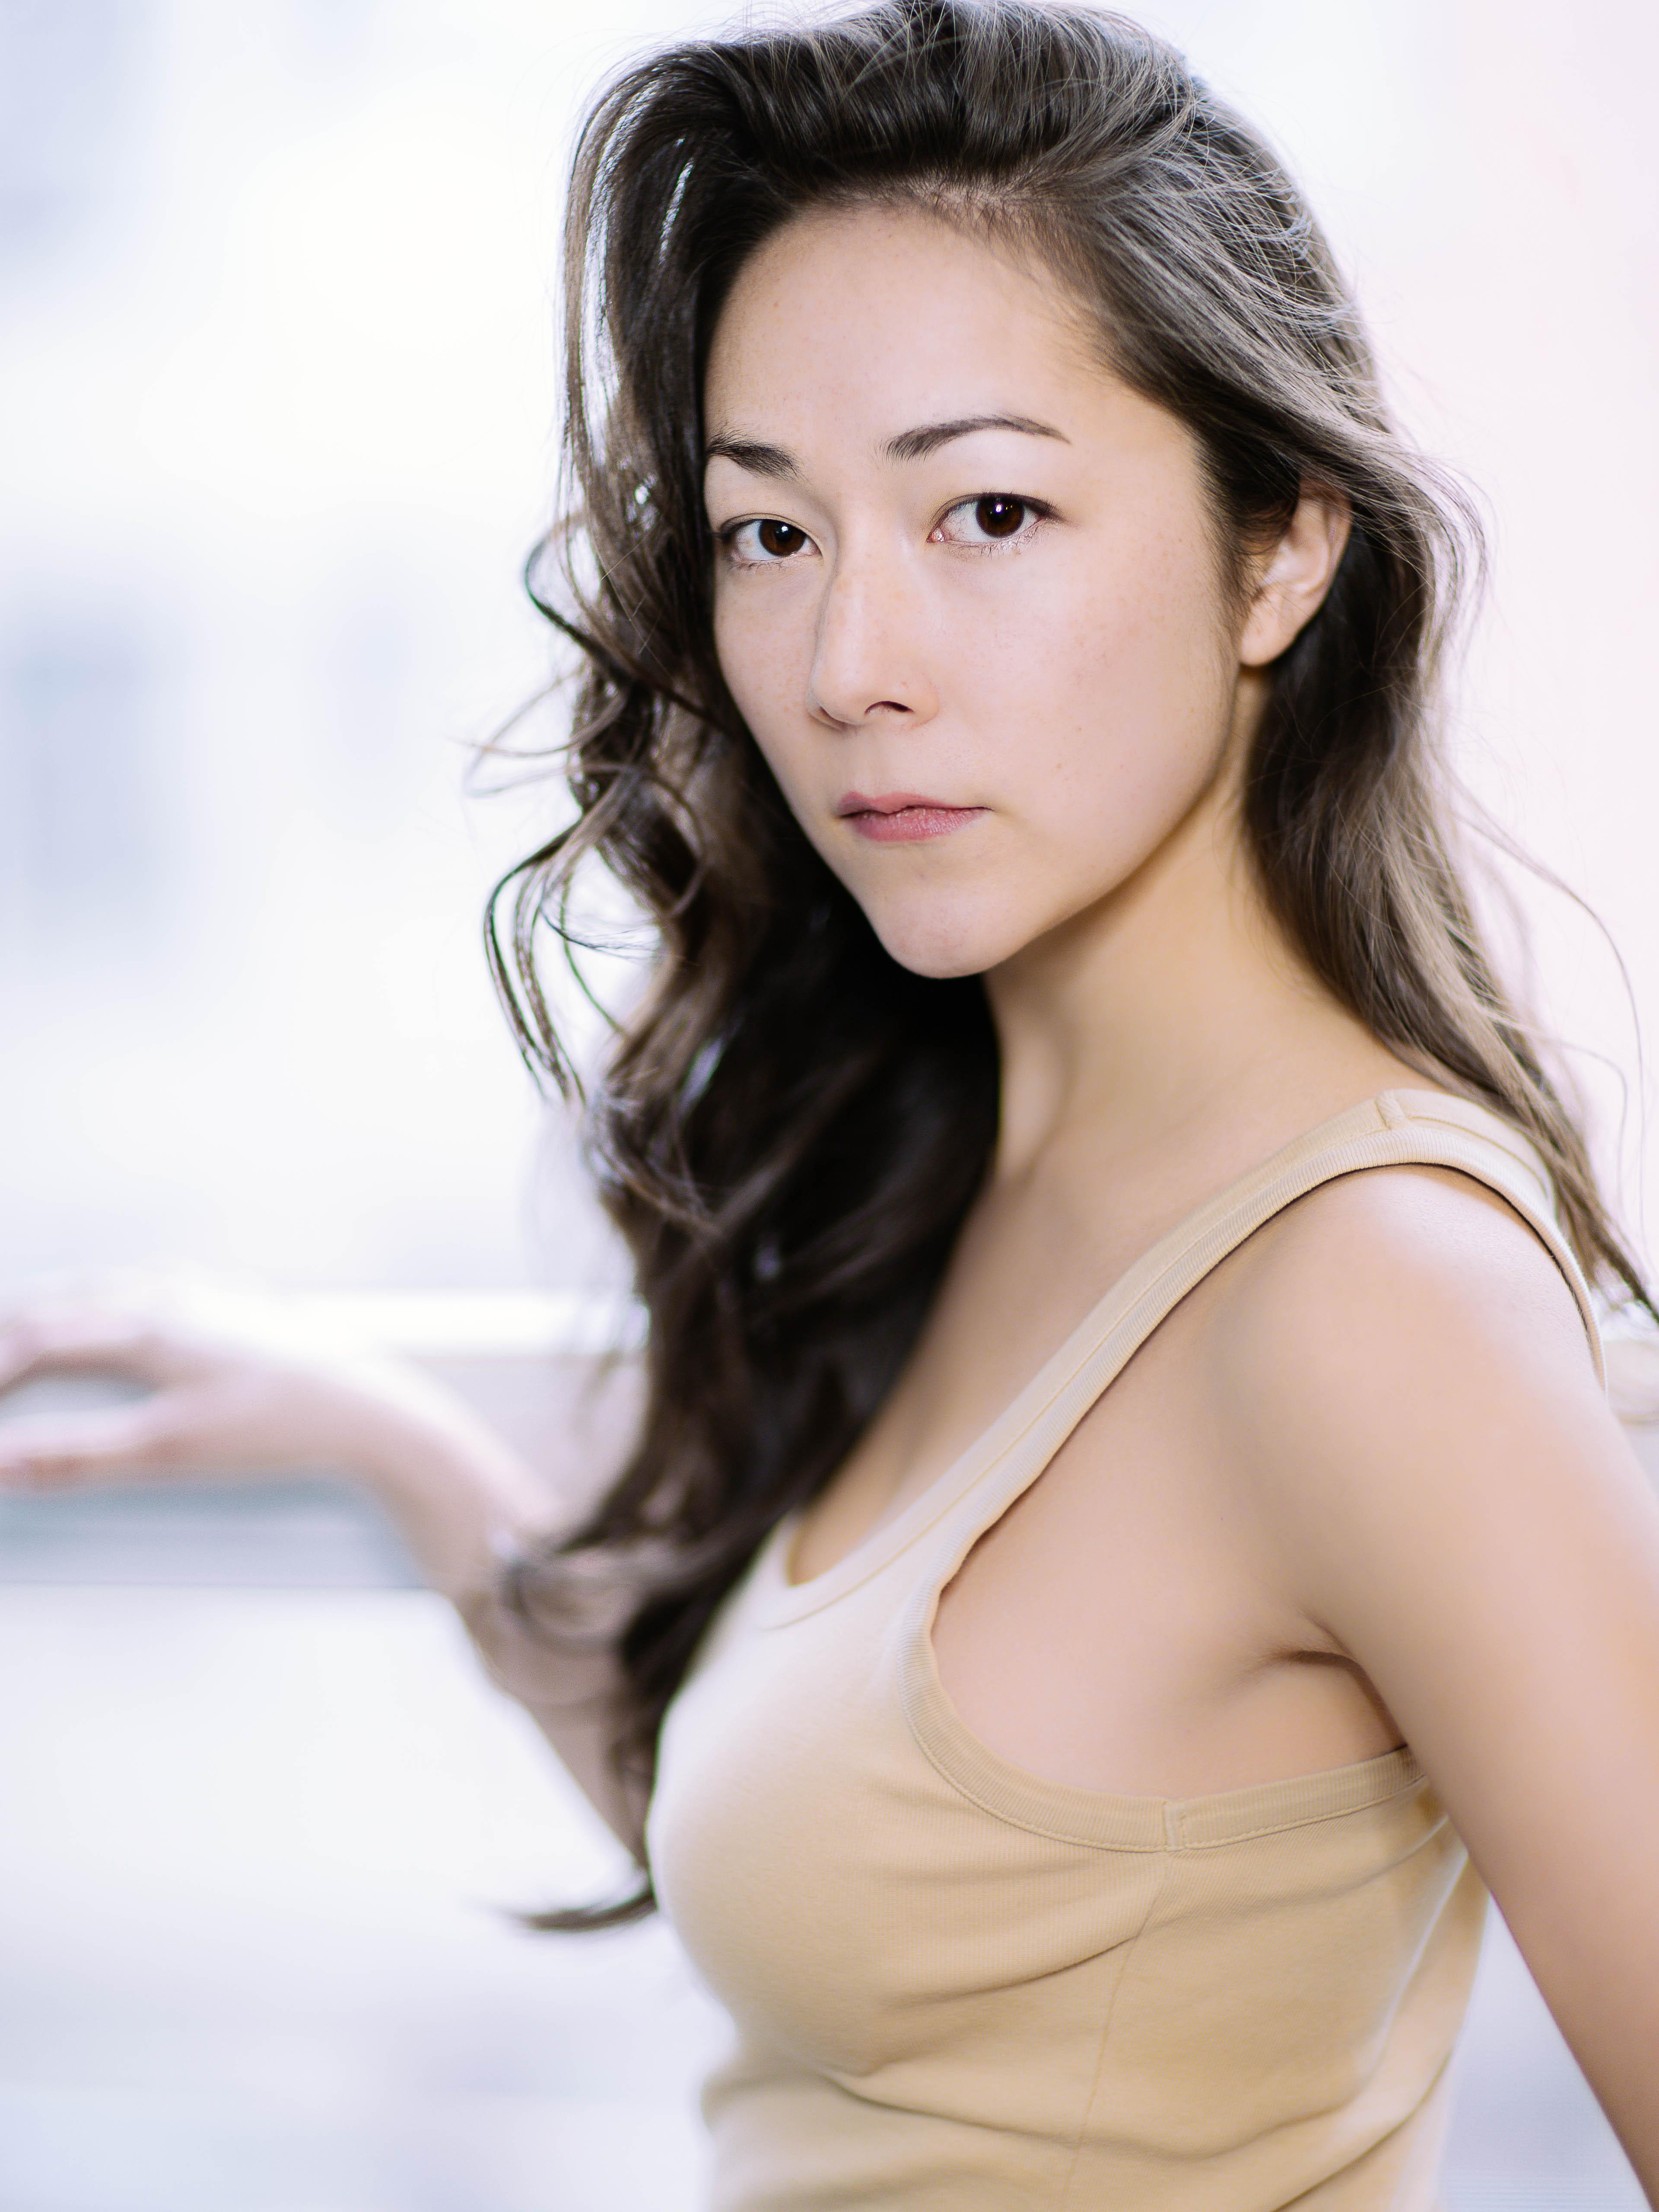 Emily Piggford - IMDbPro